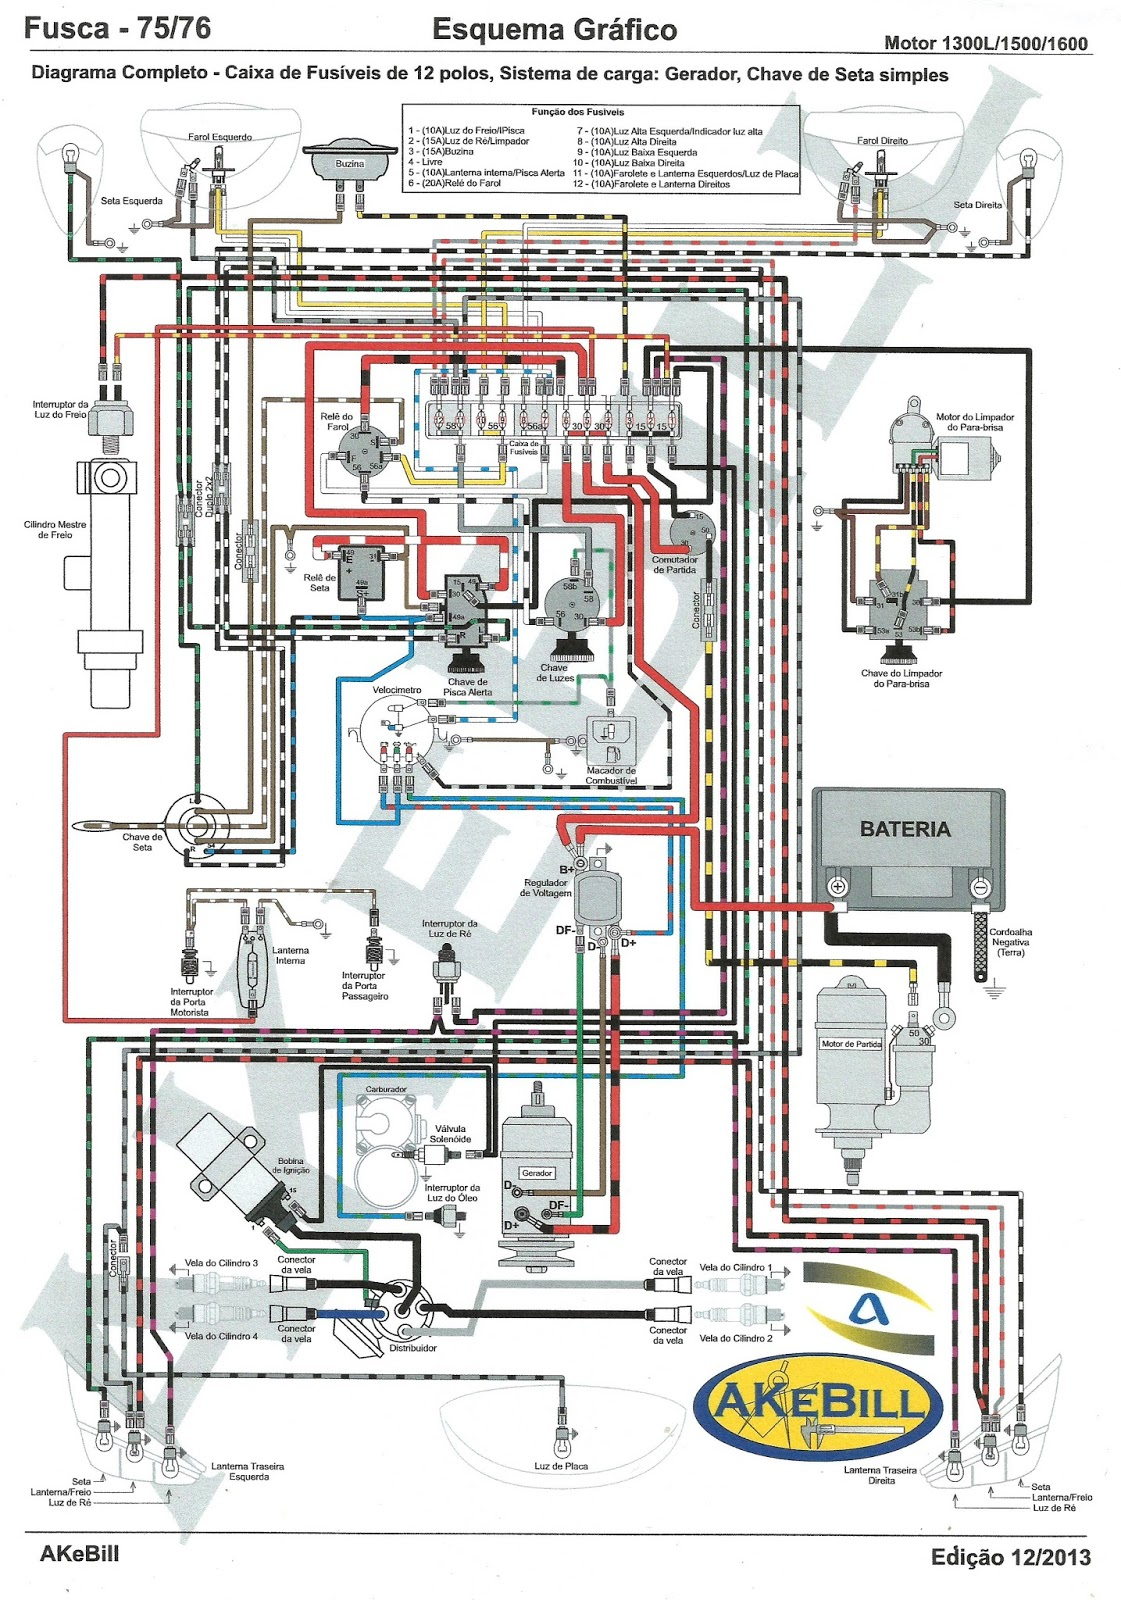 1974 nova wiring diagram [ 1121 x 1600 Pixel ]